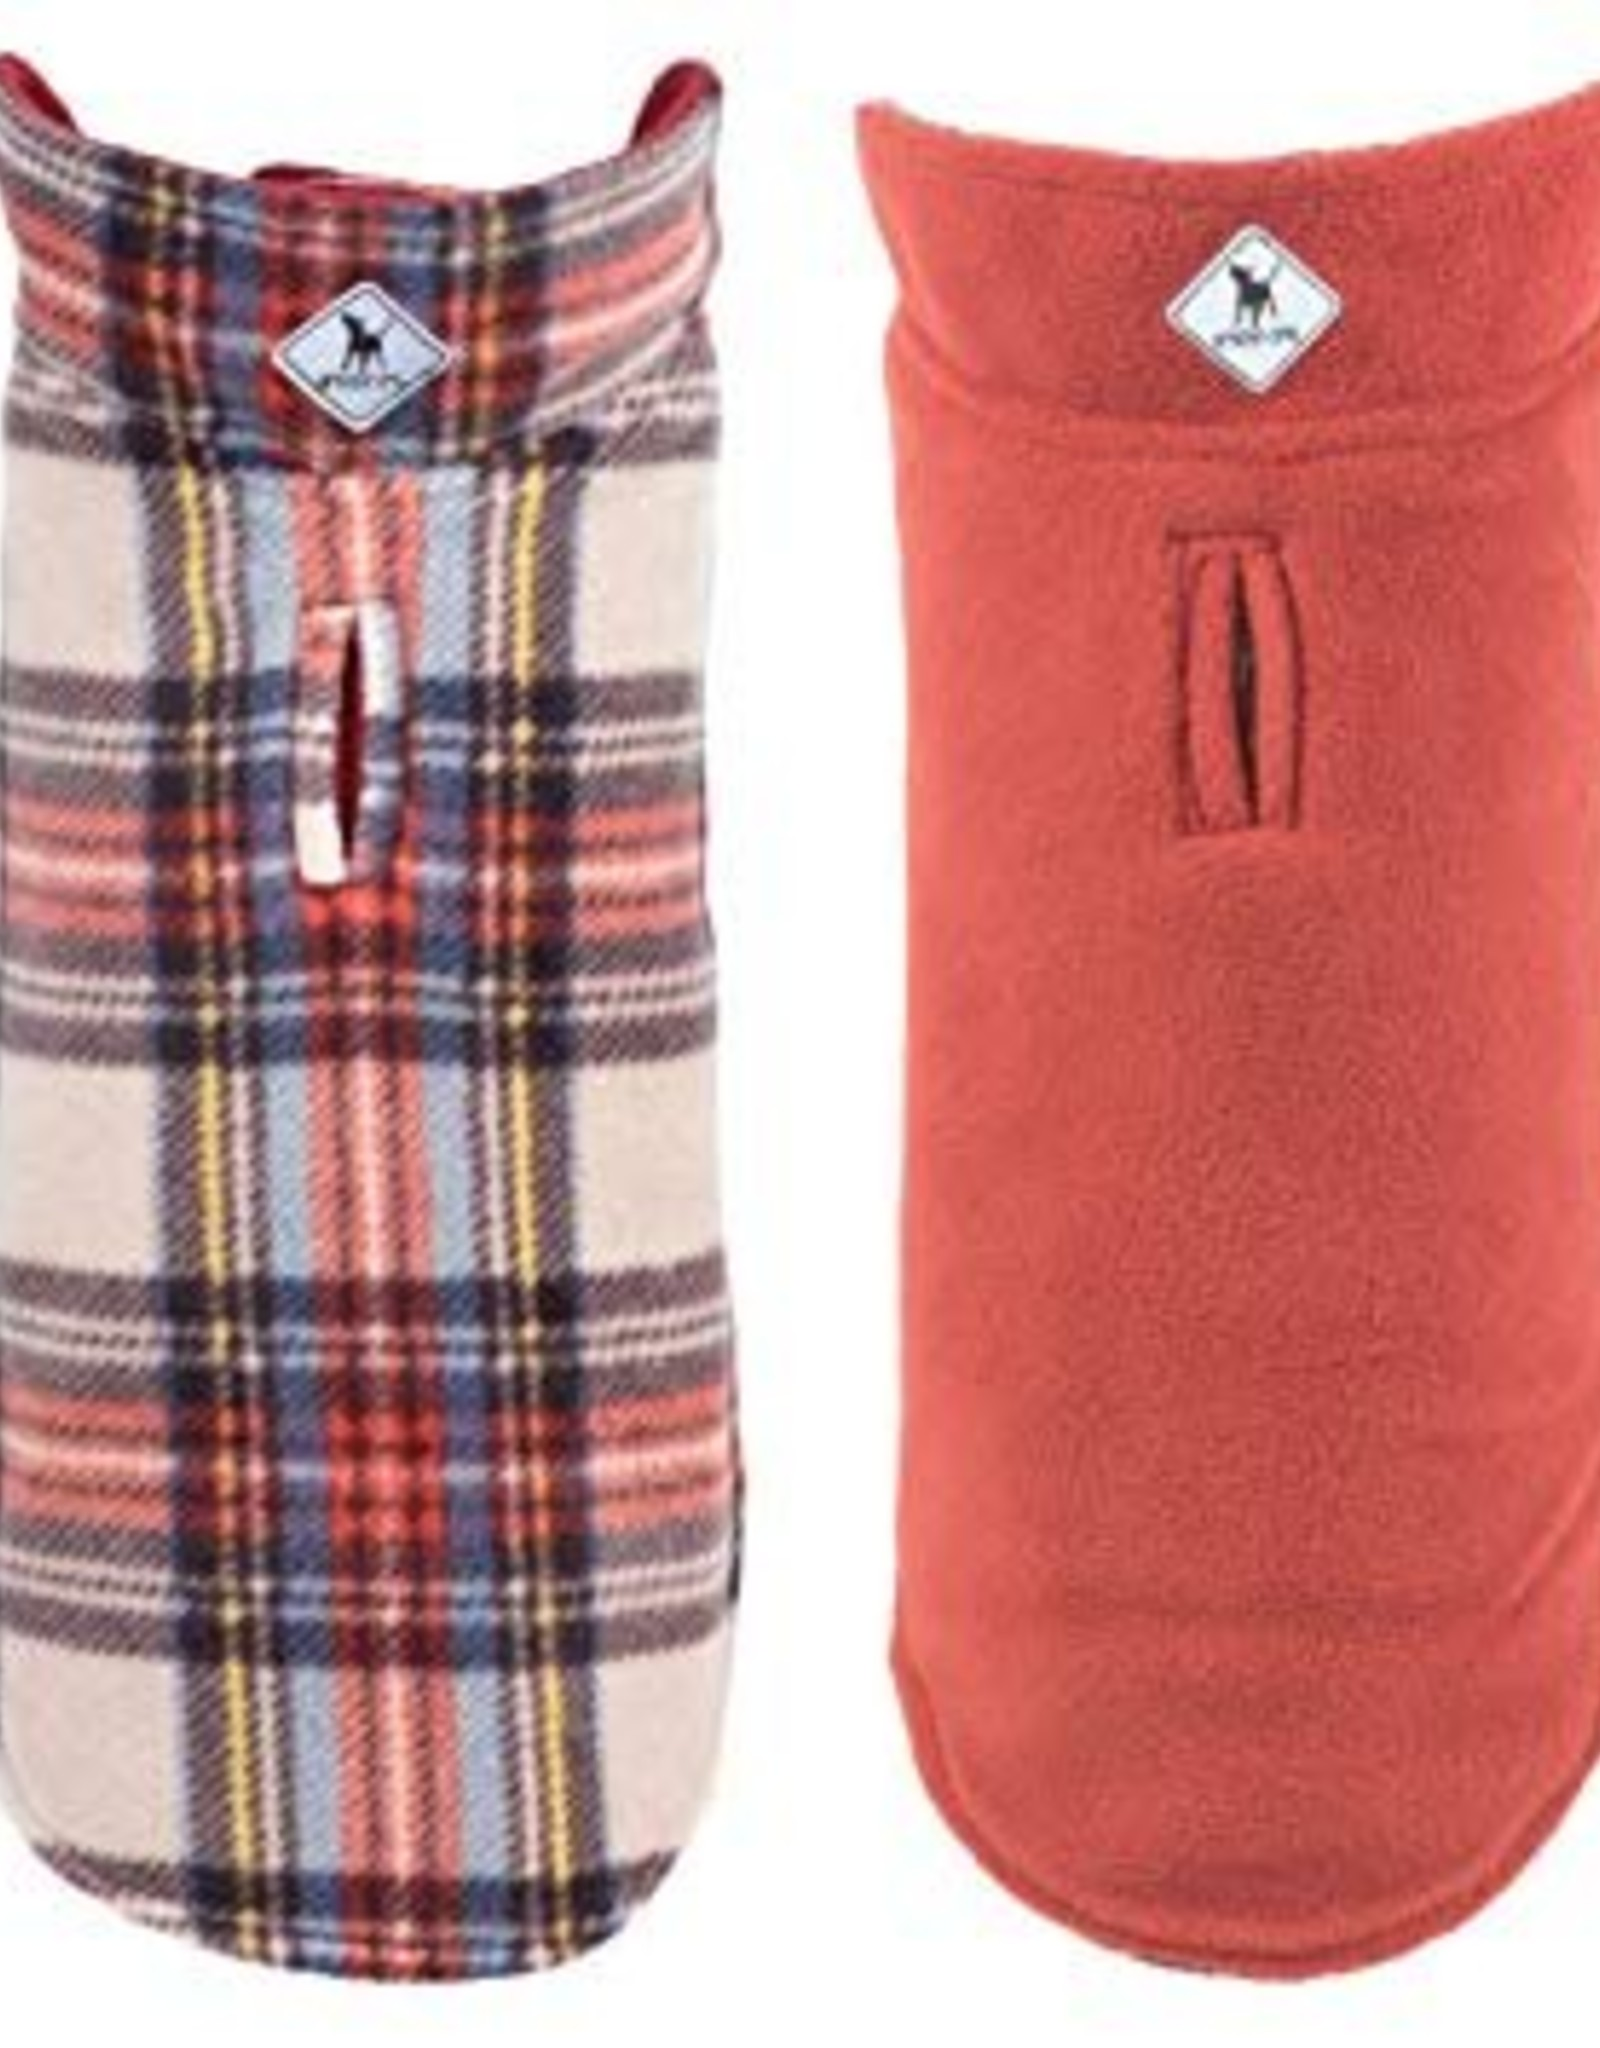 The Worthy Dog Reversible Fargo Fleece Dog Coat